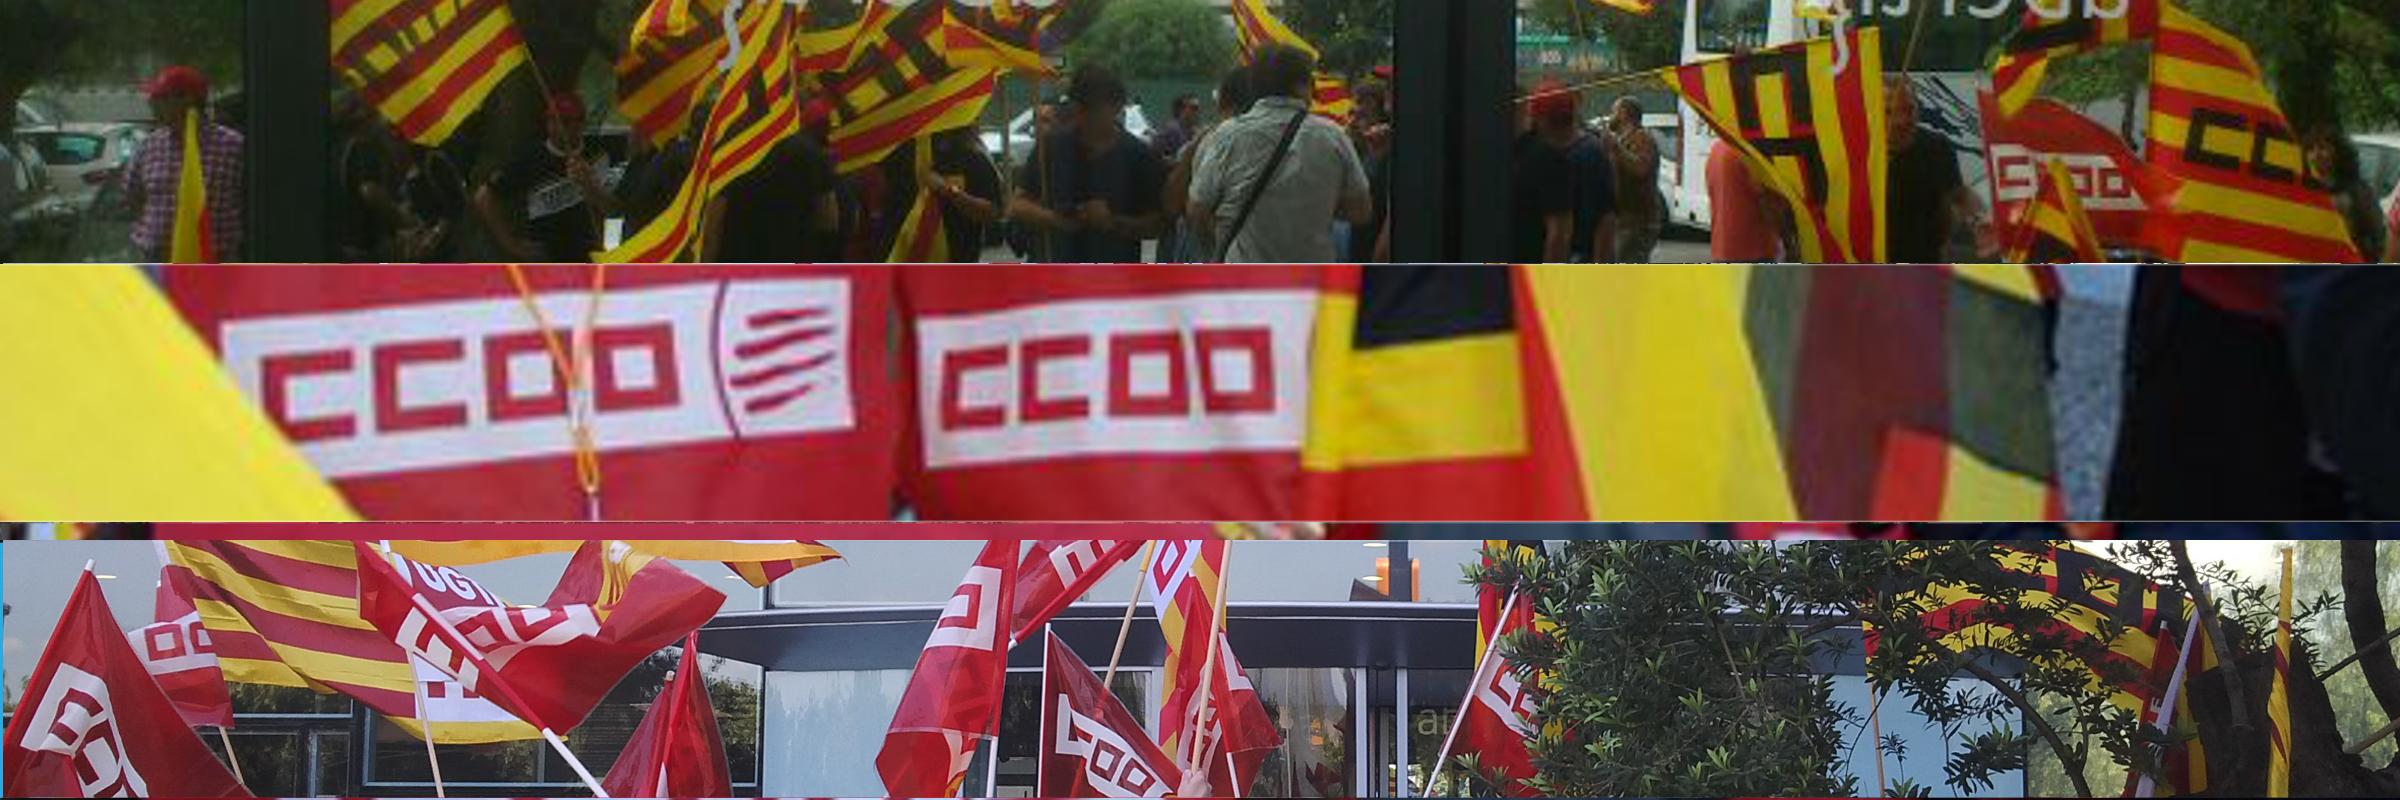 Súmate a CCOO abertis!